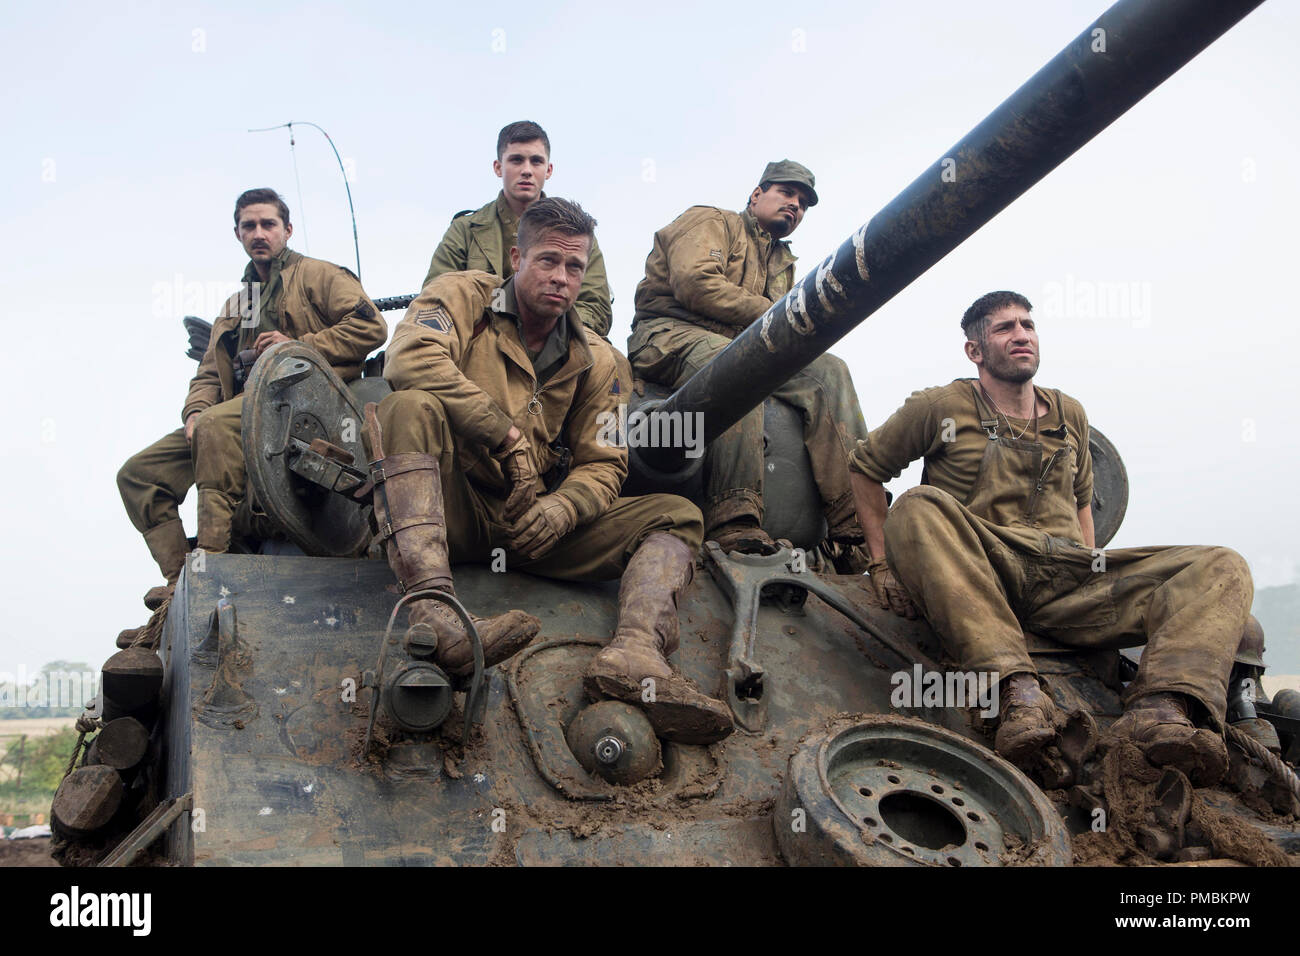 Don 'Wardaddy' Collier (Brad Pitt, centered) and his men Boyd Swan (Shia LaBeouf), Norman Ellison (Logan Lerman), Trini Garcia (Michael Peña) and Grady Travis (Jon Bernthal) in Columbia Pictures' FURY. - Stock Image